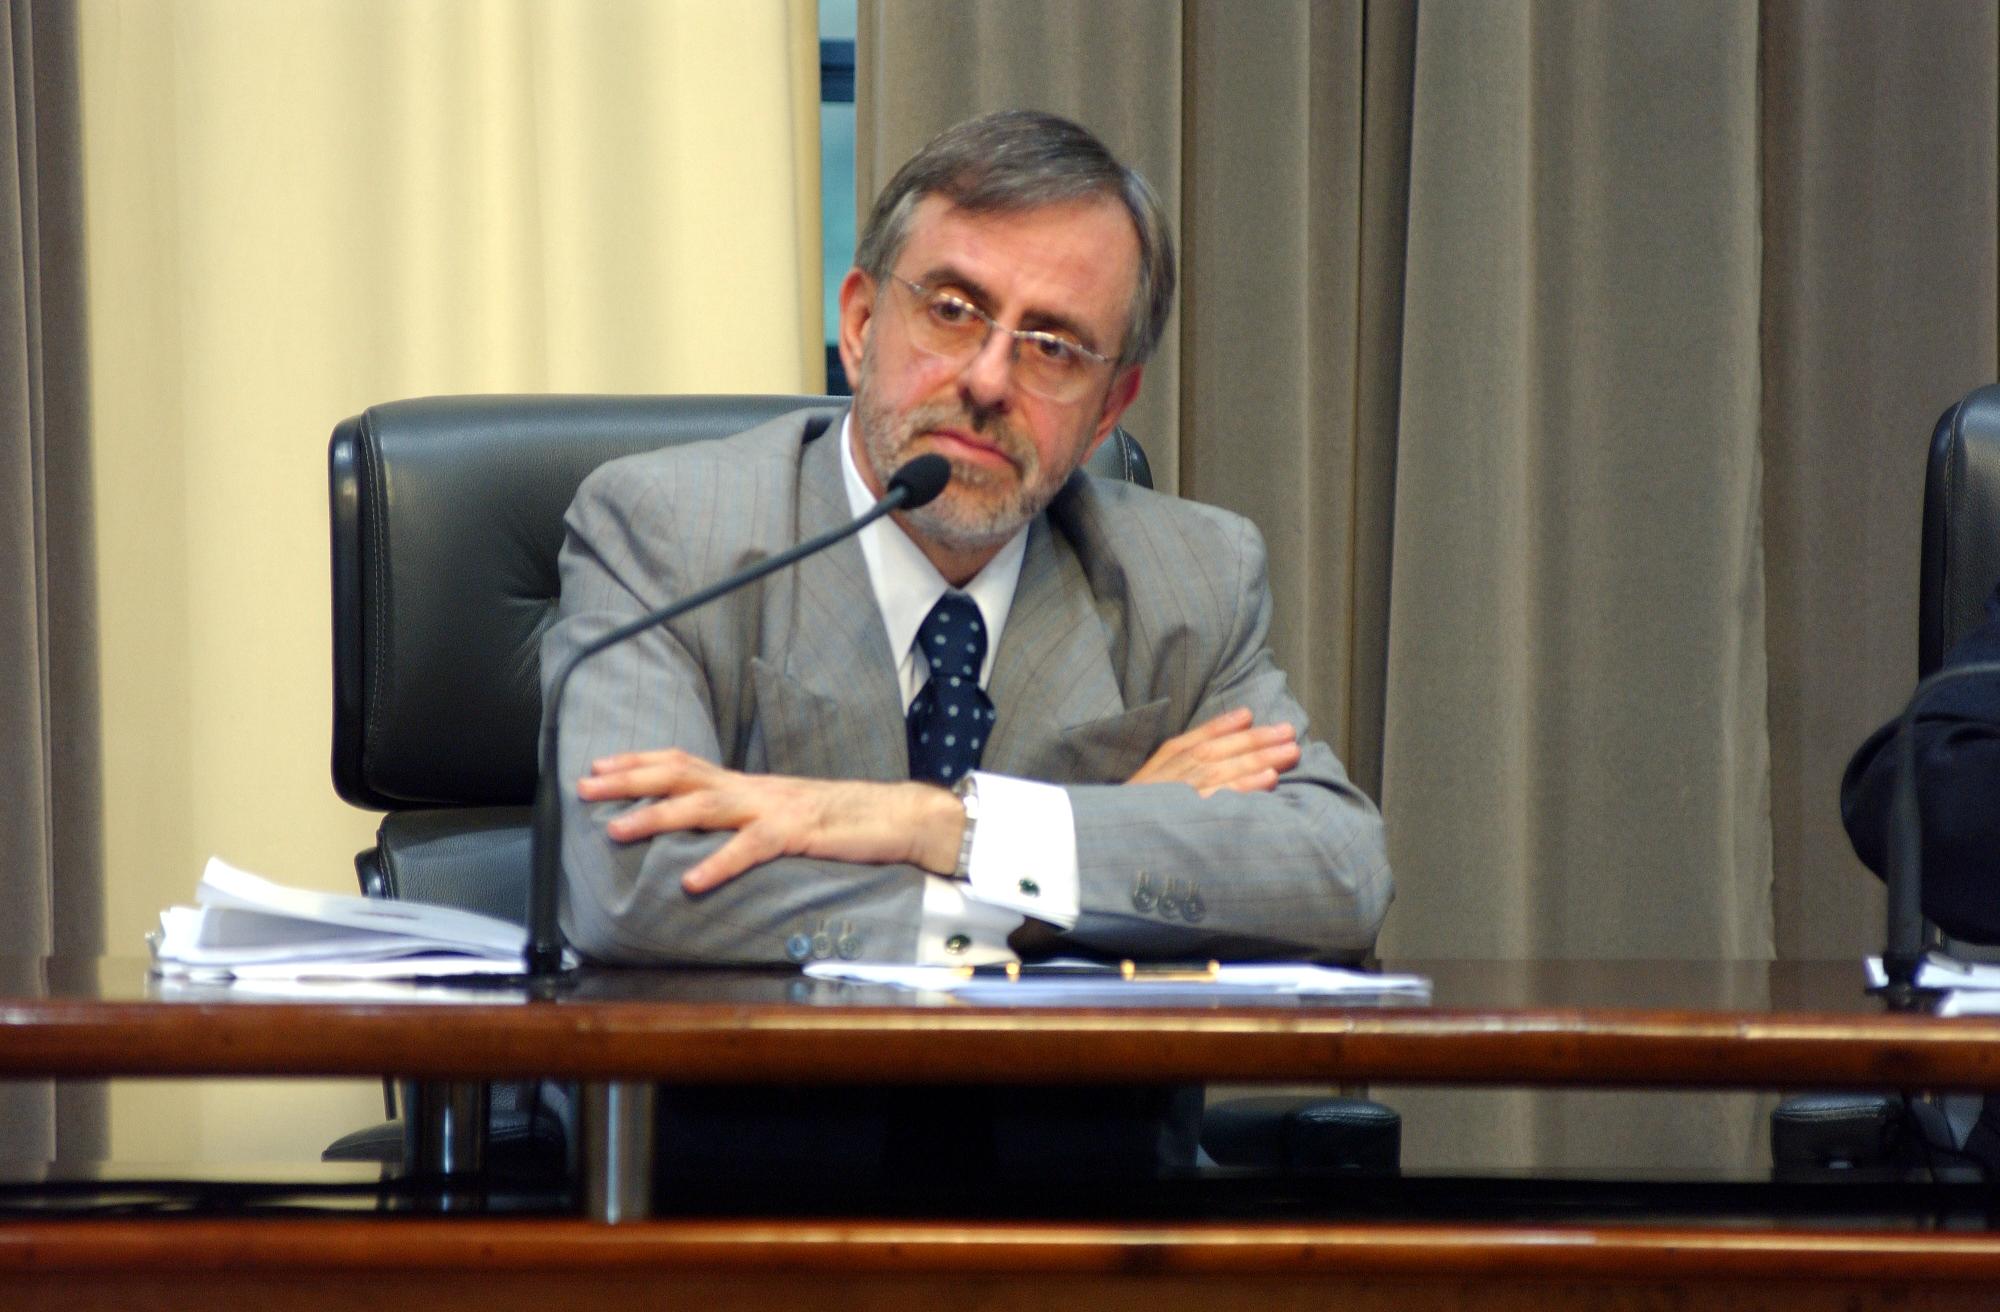 Deputado José Carlos Stangarlini preside a Comissão de Promoção Social<a style='float:right' href='https://www3.al.sp.gov.br/repositorio/noticia/hist/Stangarlini.jpg' target=_blank><img src='/_img/material-file-download-white.png' width='14px' alt='Clique para baixar a imagem'></a>